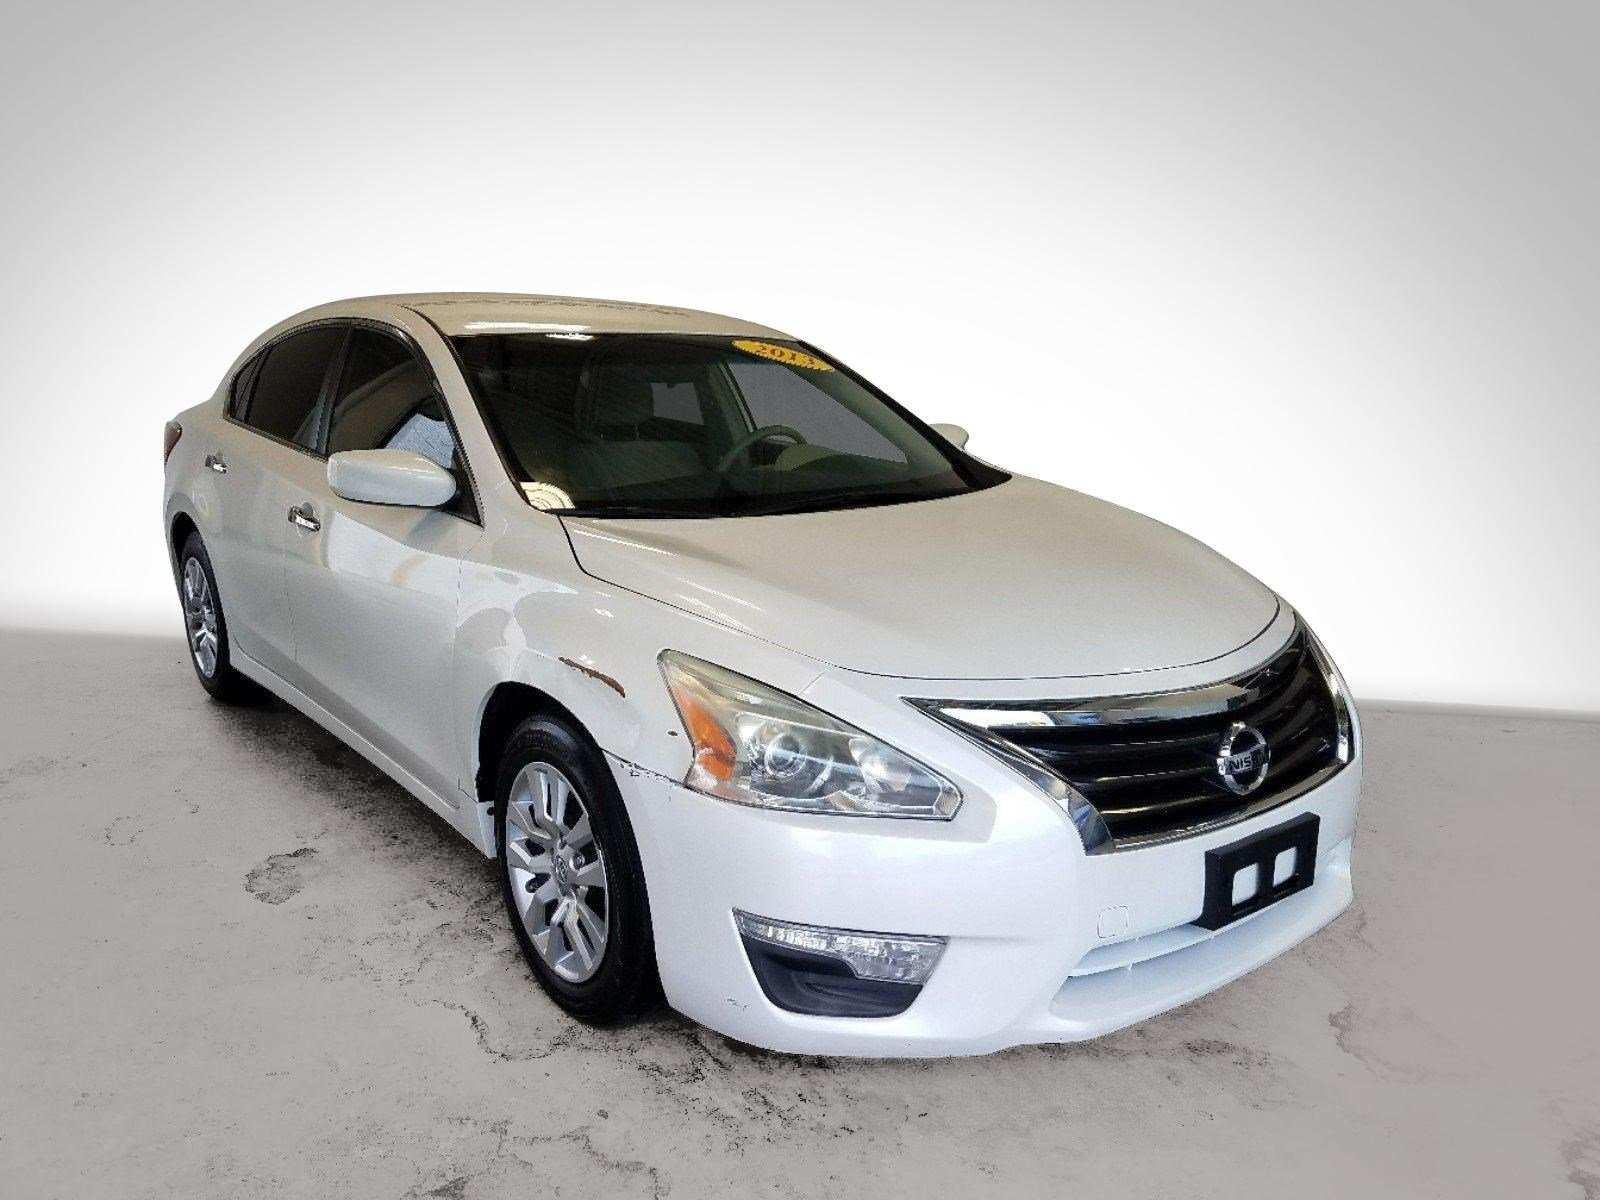 85 Gallery of 2013 Nissan Altima Sedan History by 2013 Nissan Altima Sedan